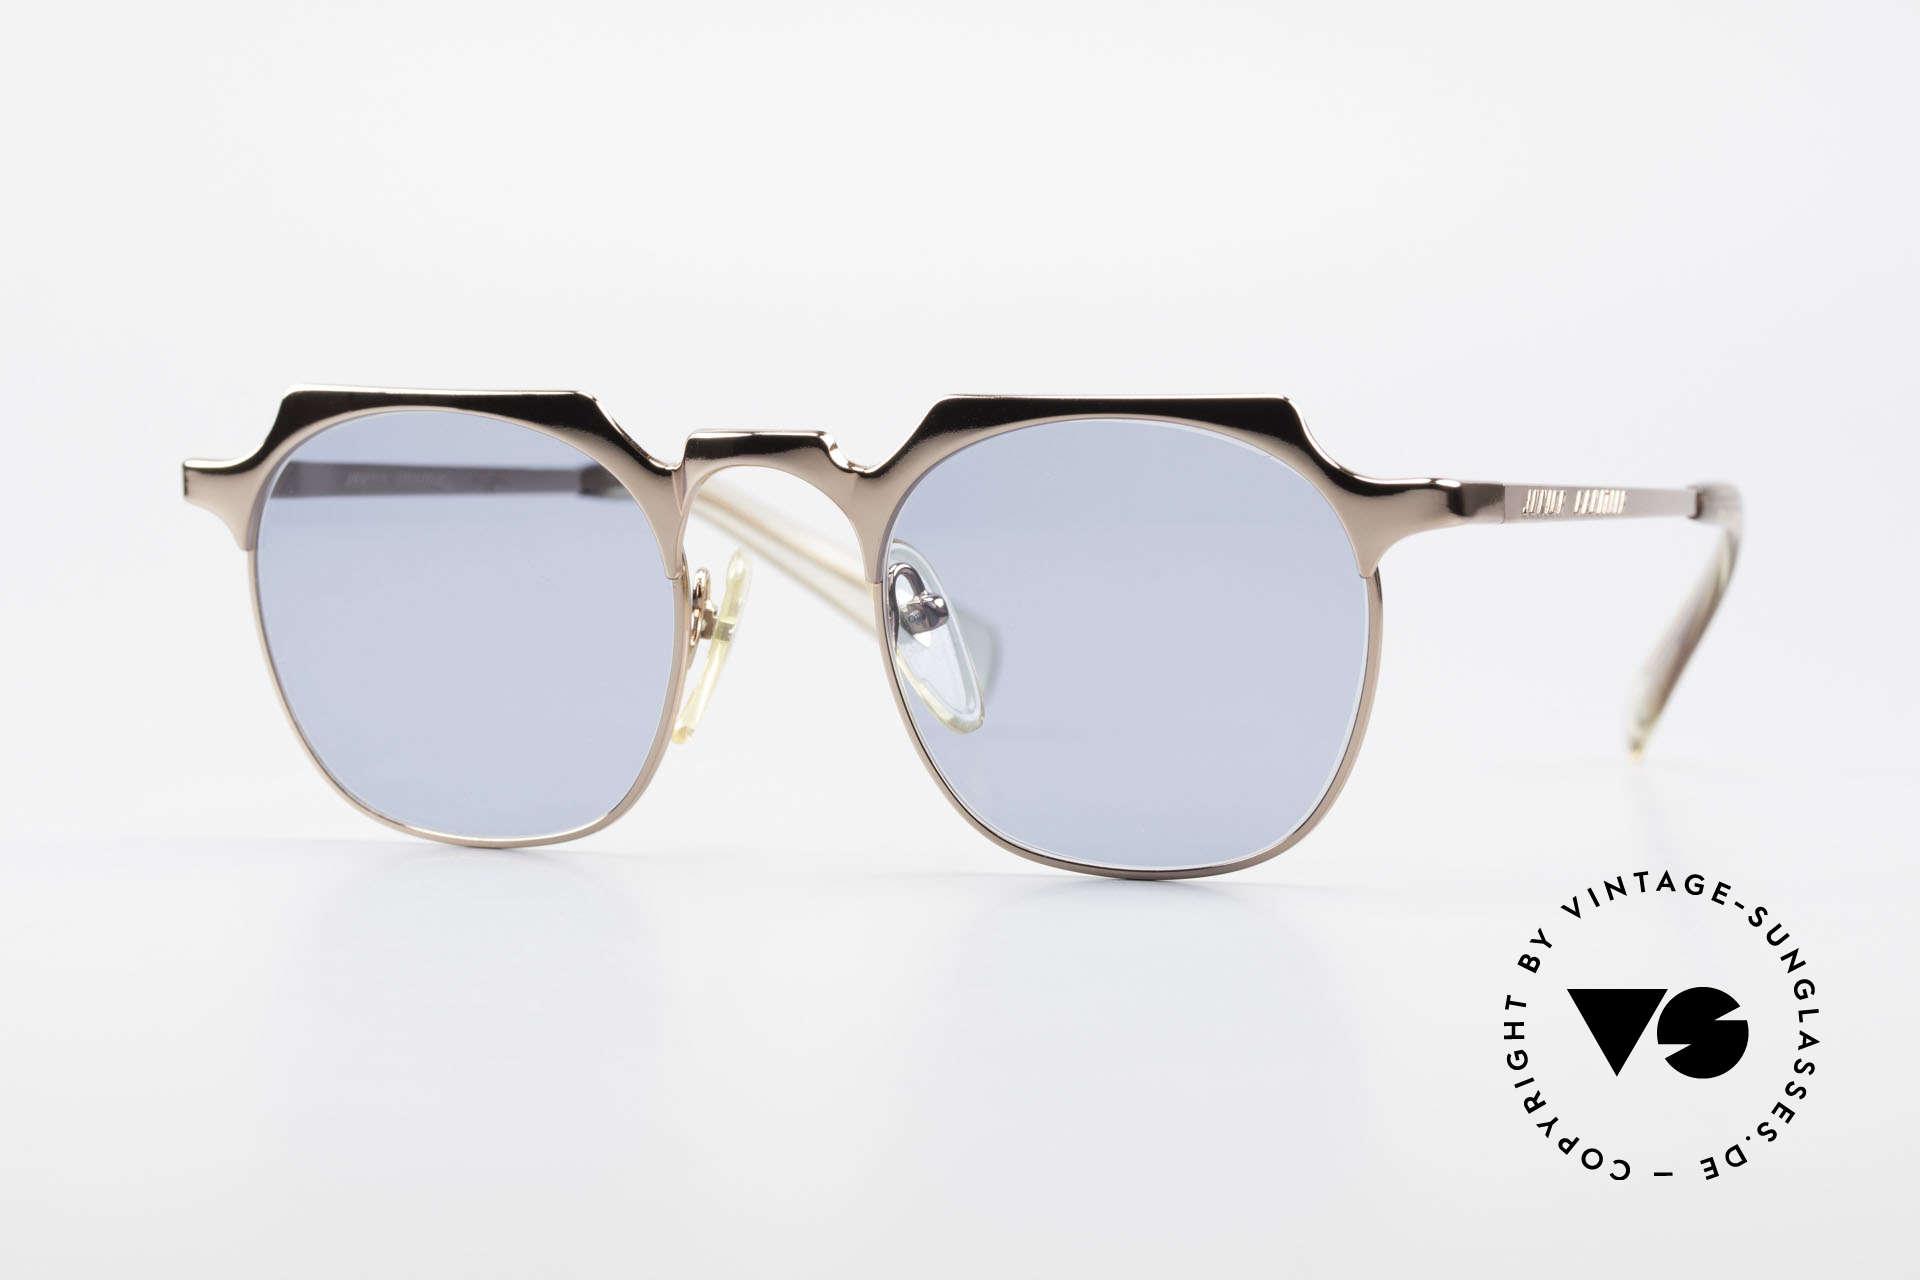 Jean Paul Gaultier 57-0171 Panto Designer Sunglasses, very noble vintage sunglasses by Jean Paul Gaultier, Made for Men and Women